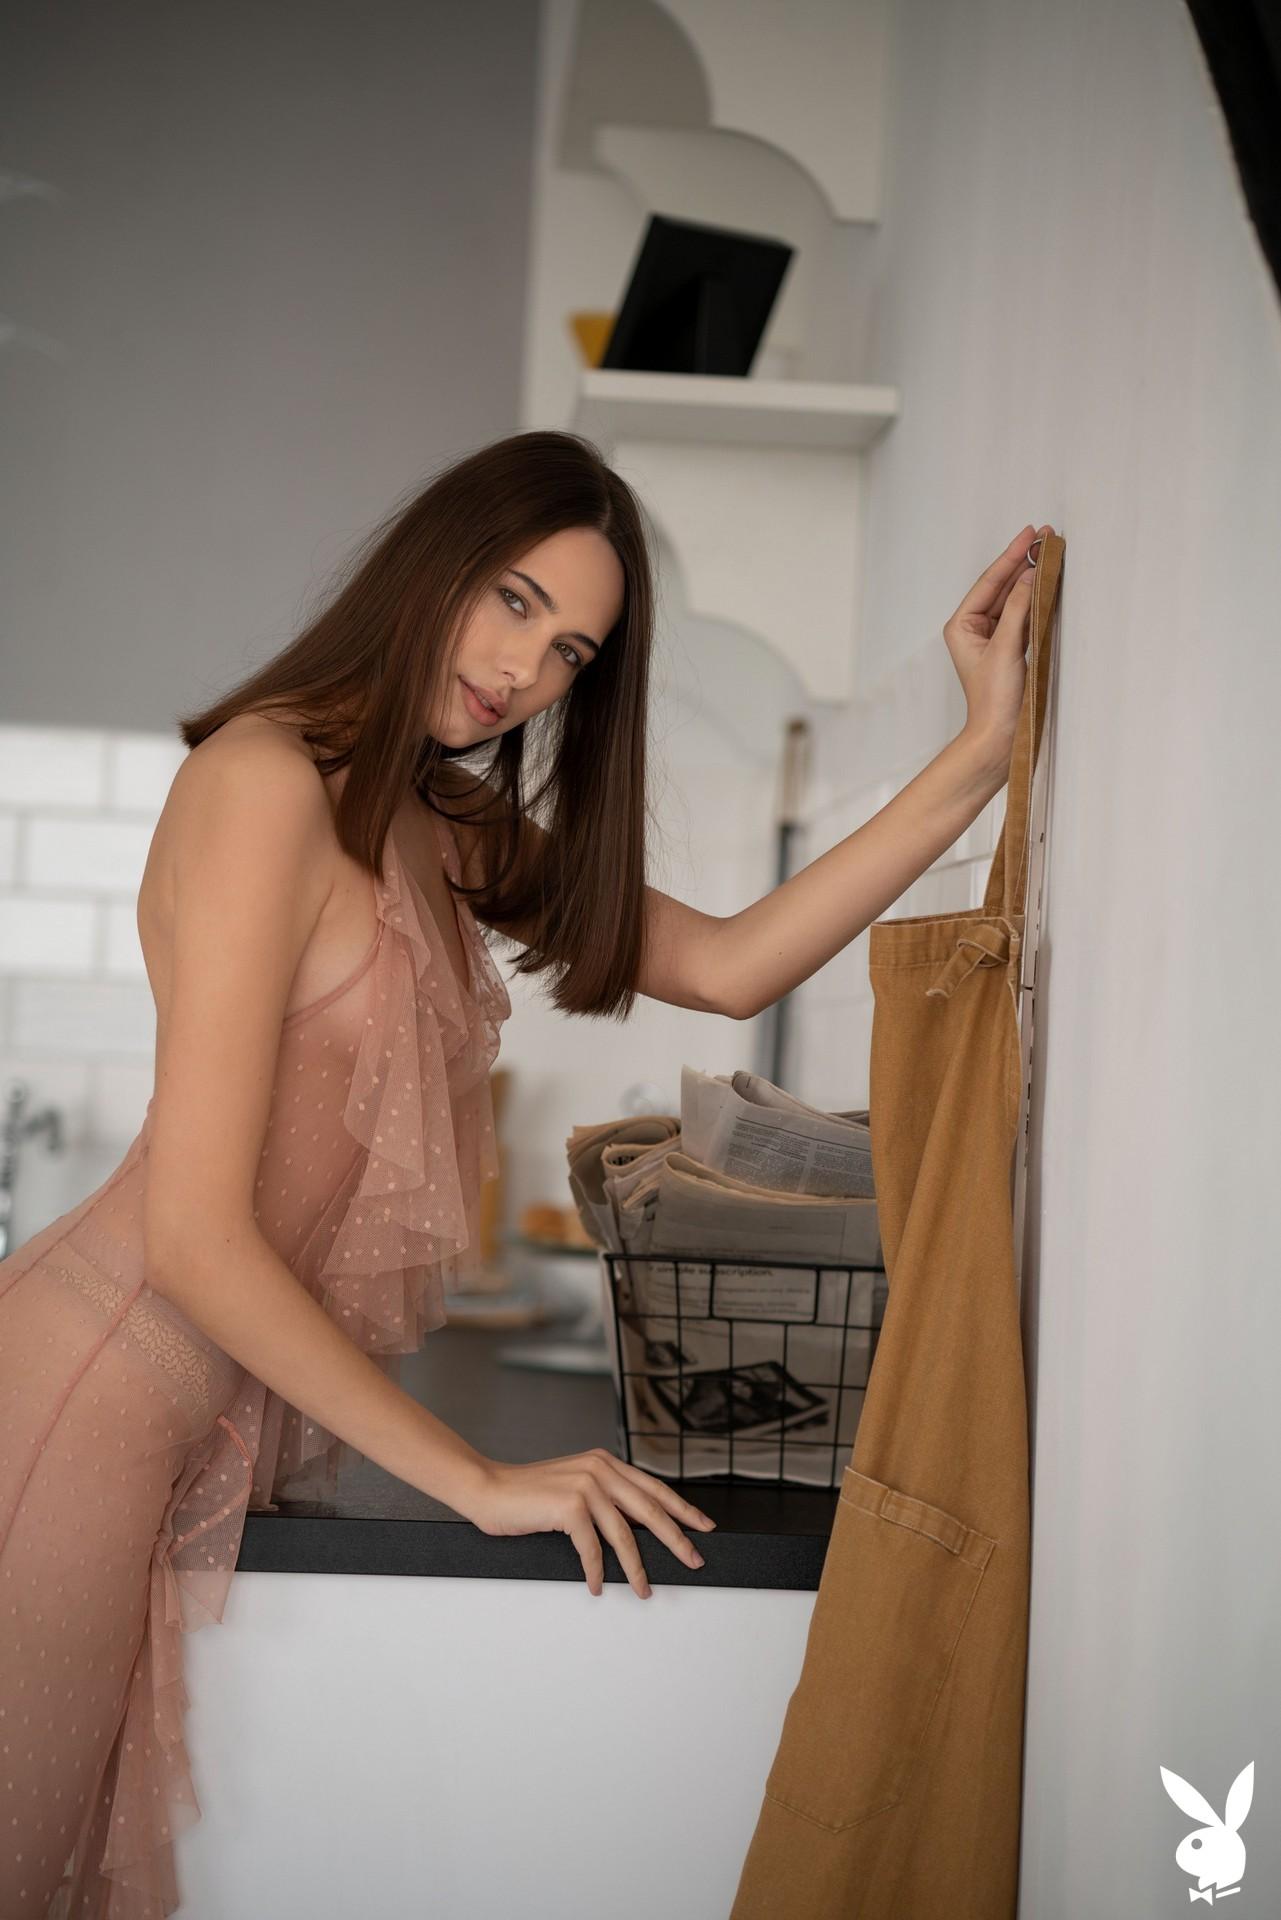 Katrine Pirs In Essence Of Life Playboy Plus (1)